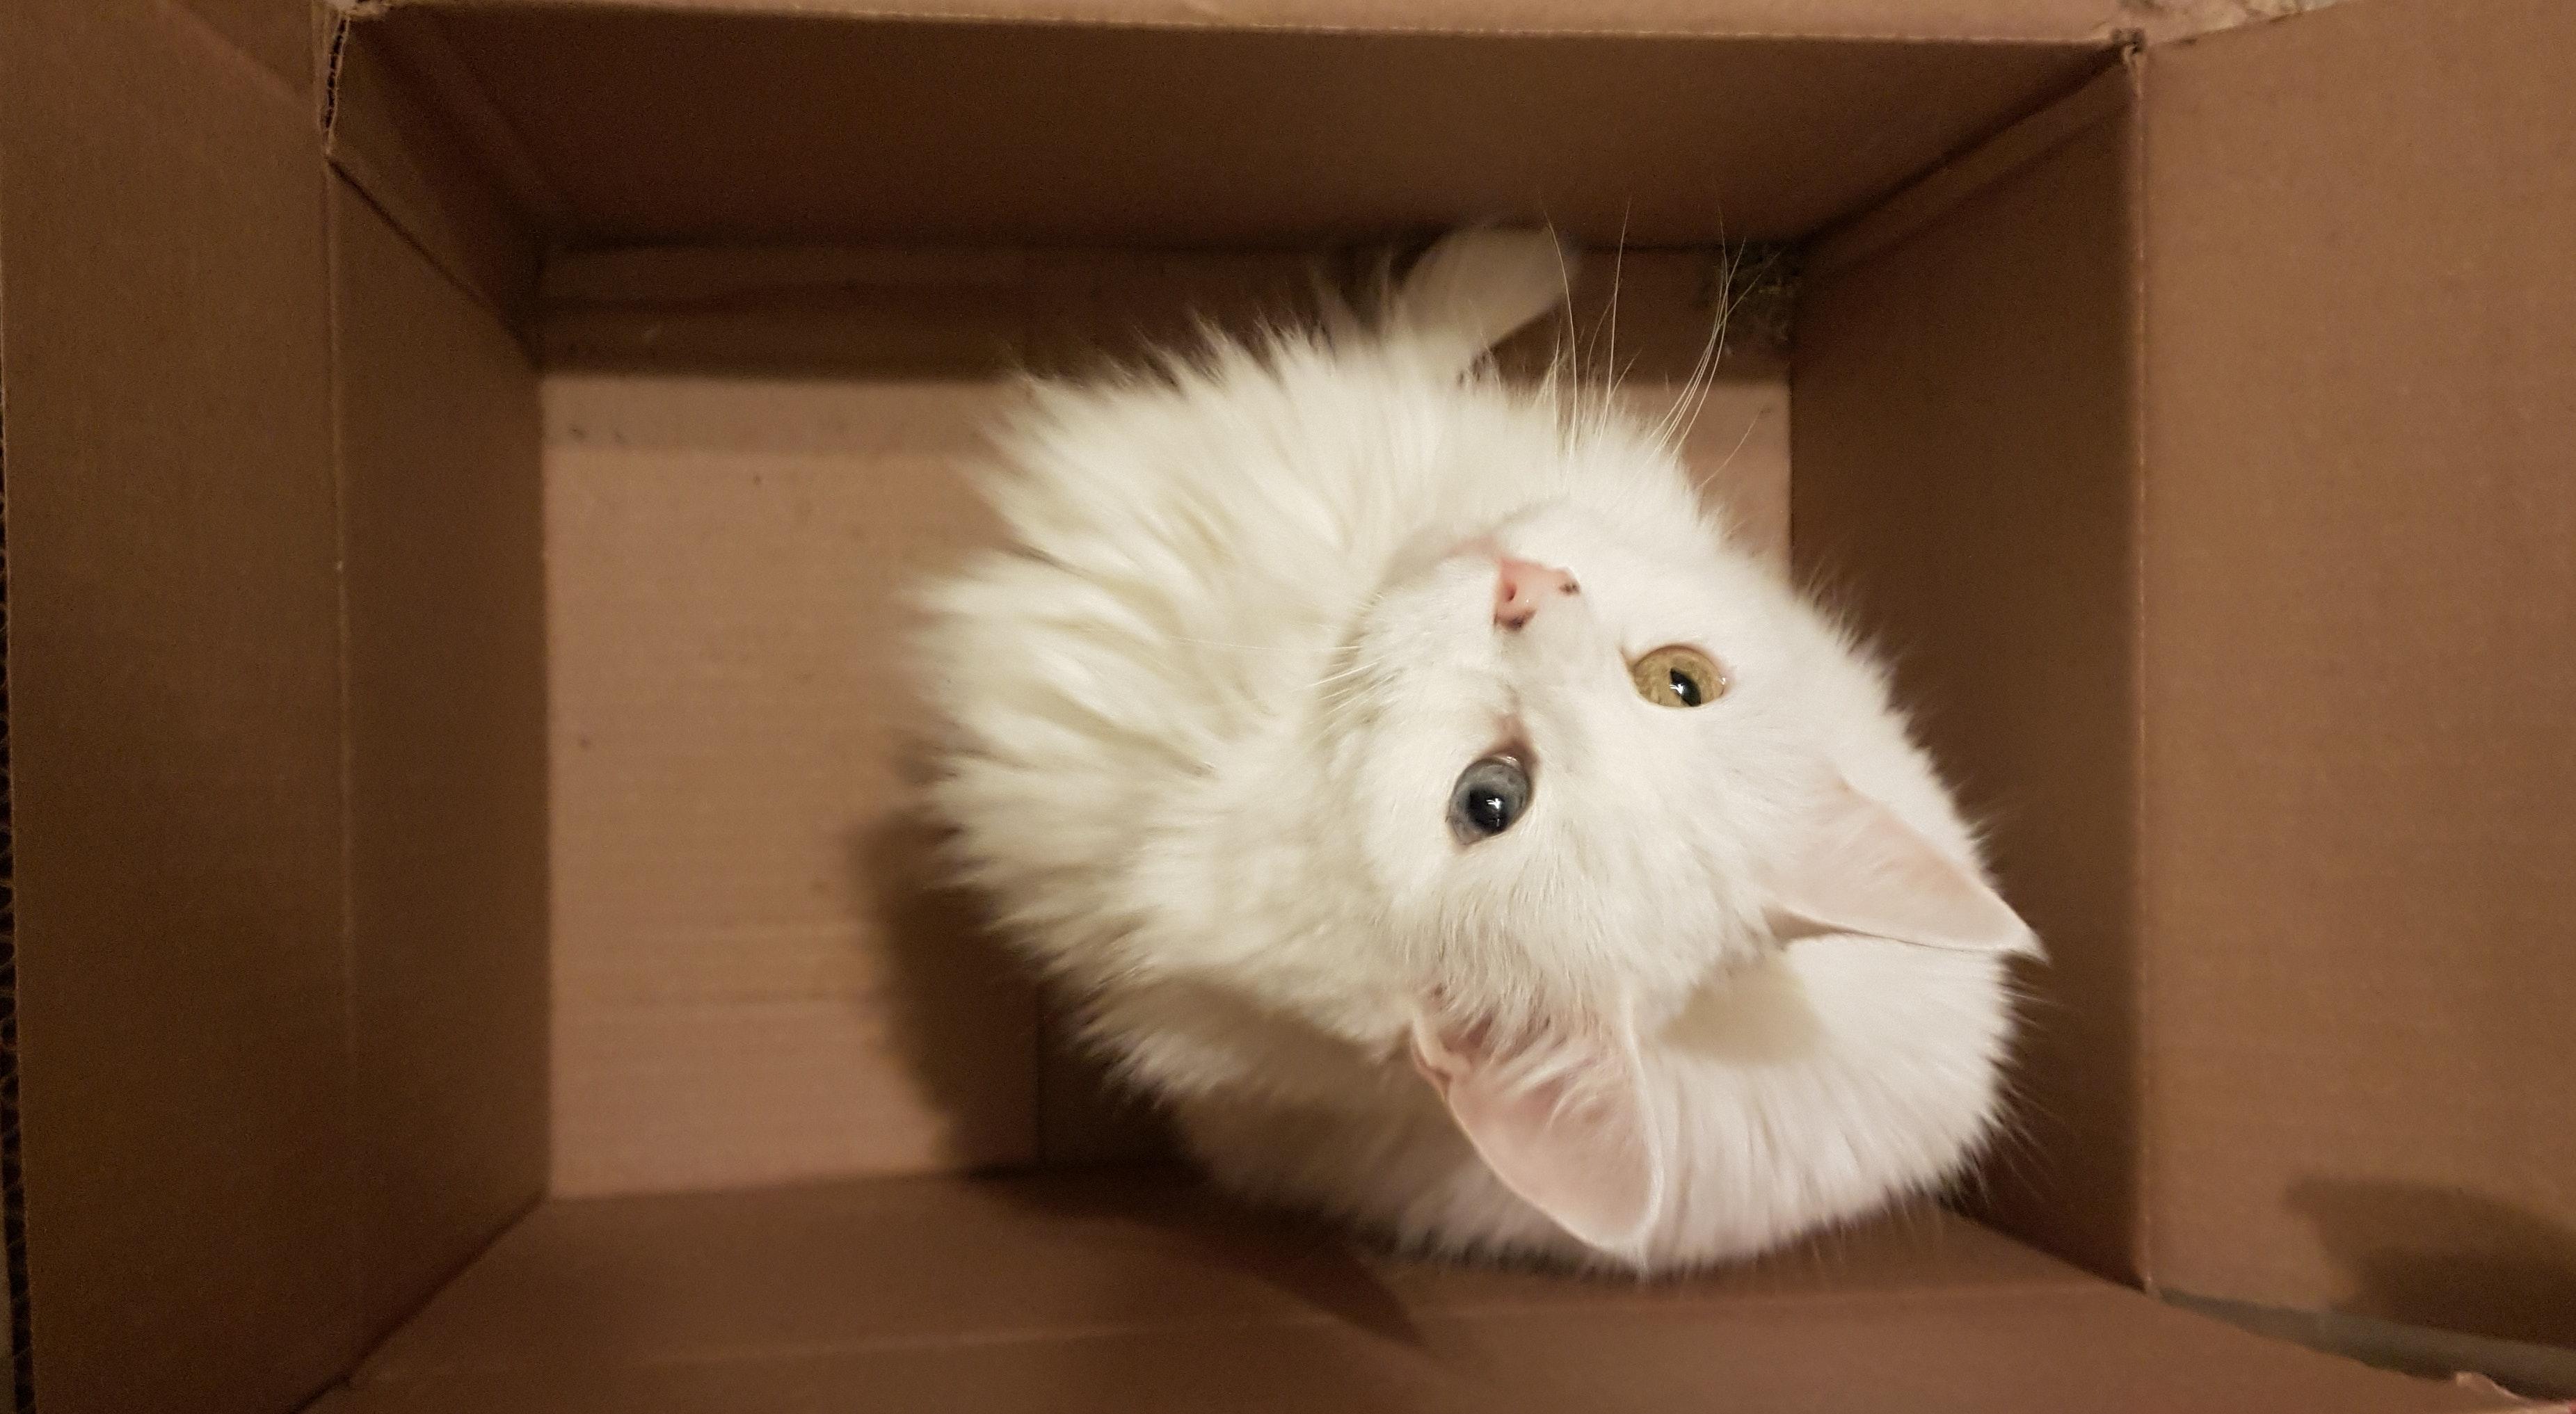 Free stock photo of #cat #animal #white #eyes #cute #box